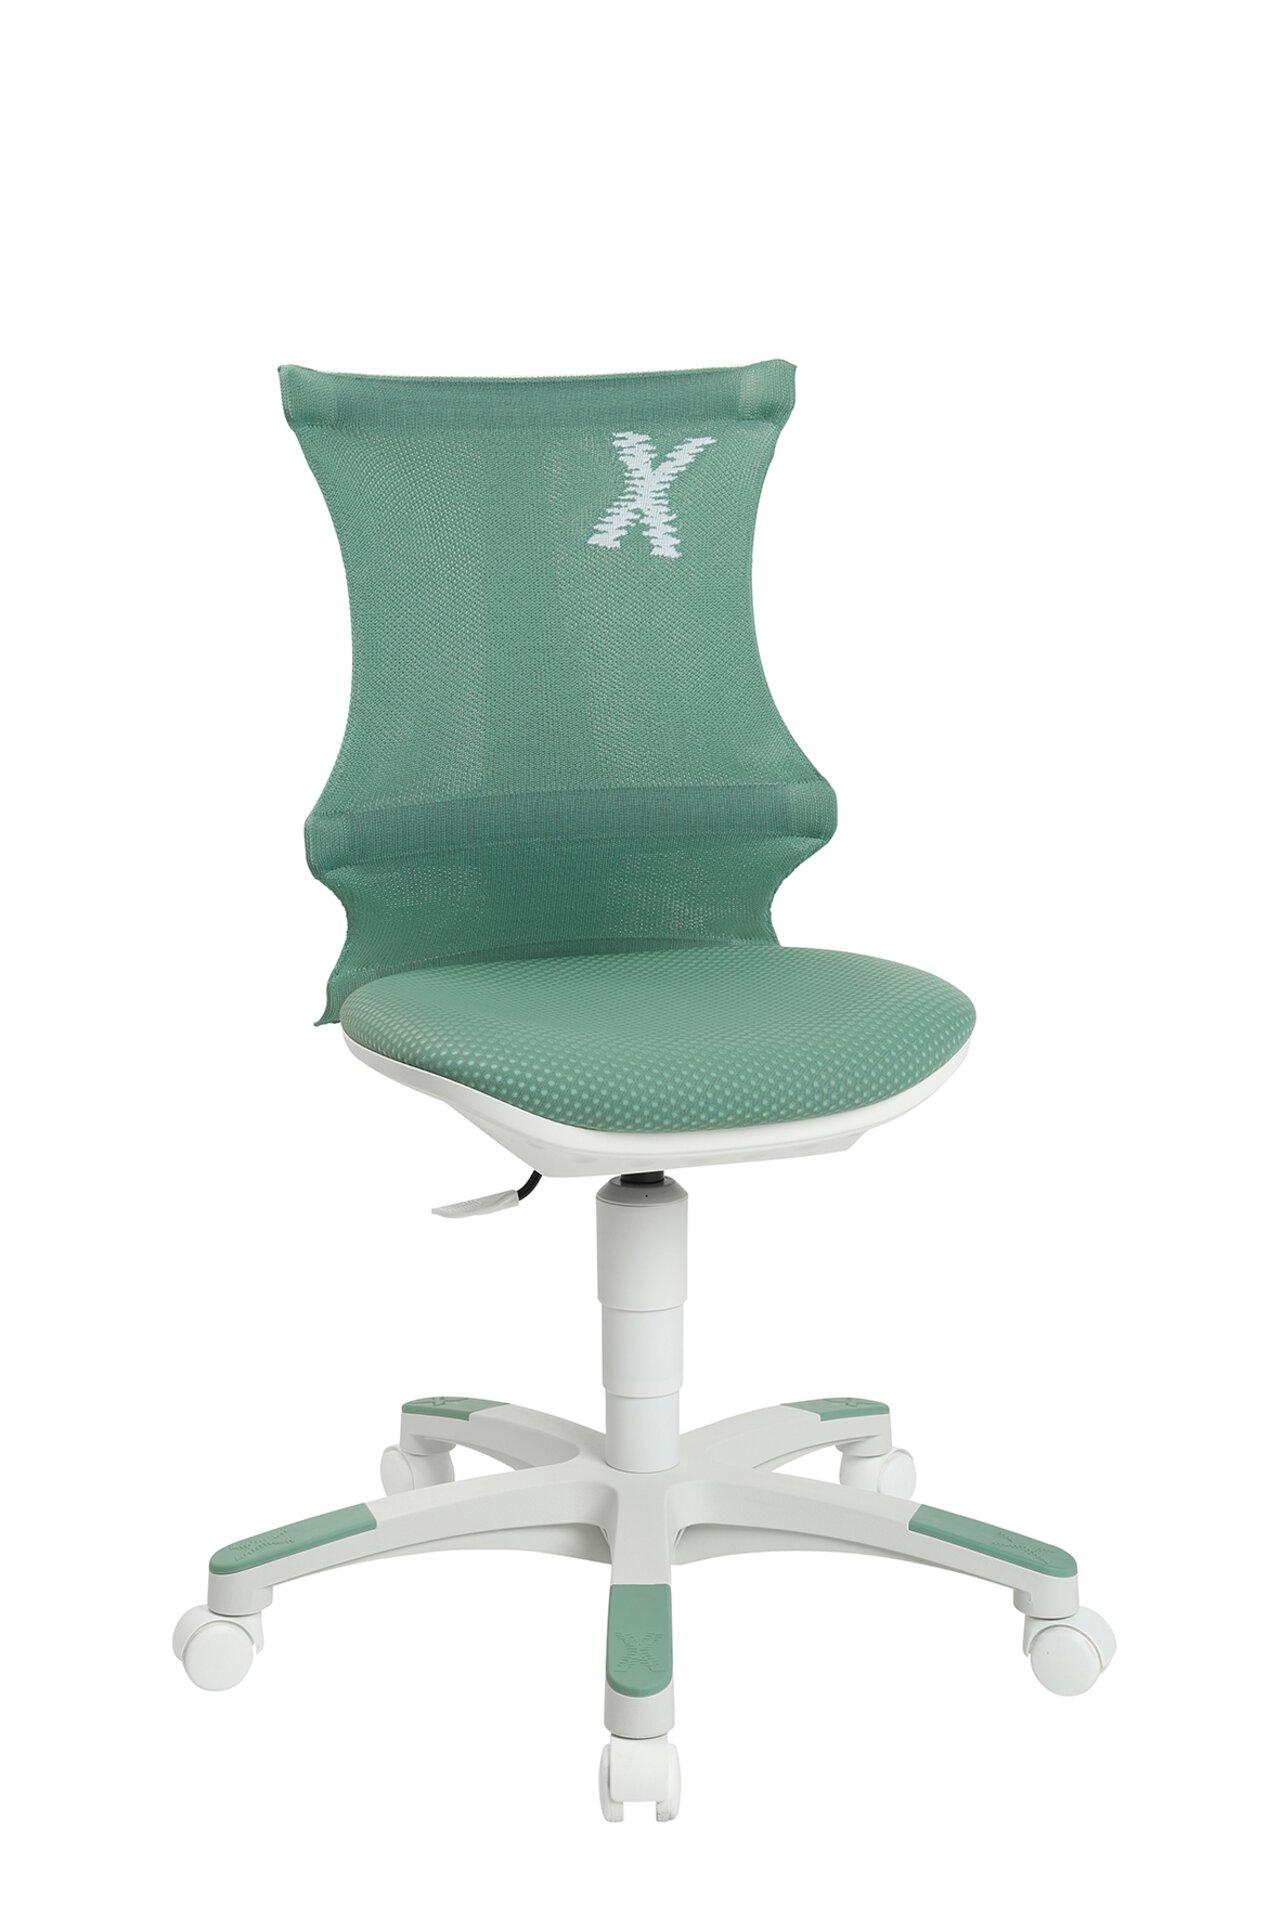 Büro-Drehstuhl SITNESS X-CHAIR 10 Topstar Textil grün 49 x 99 x 54 cm